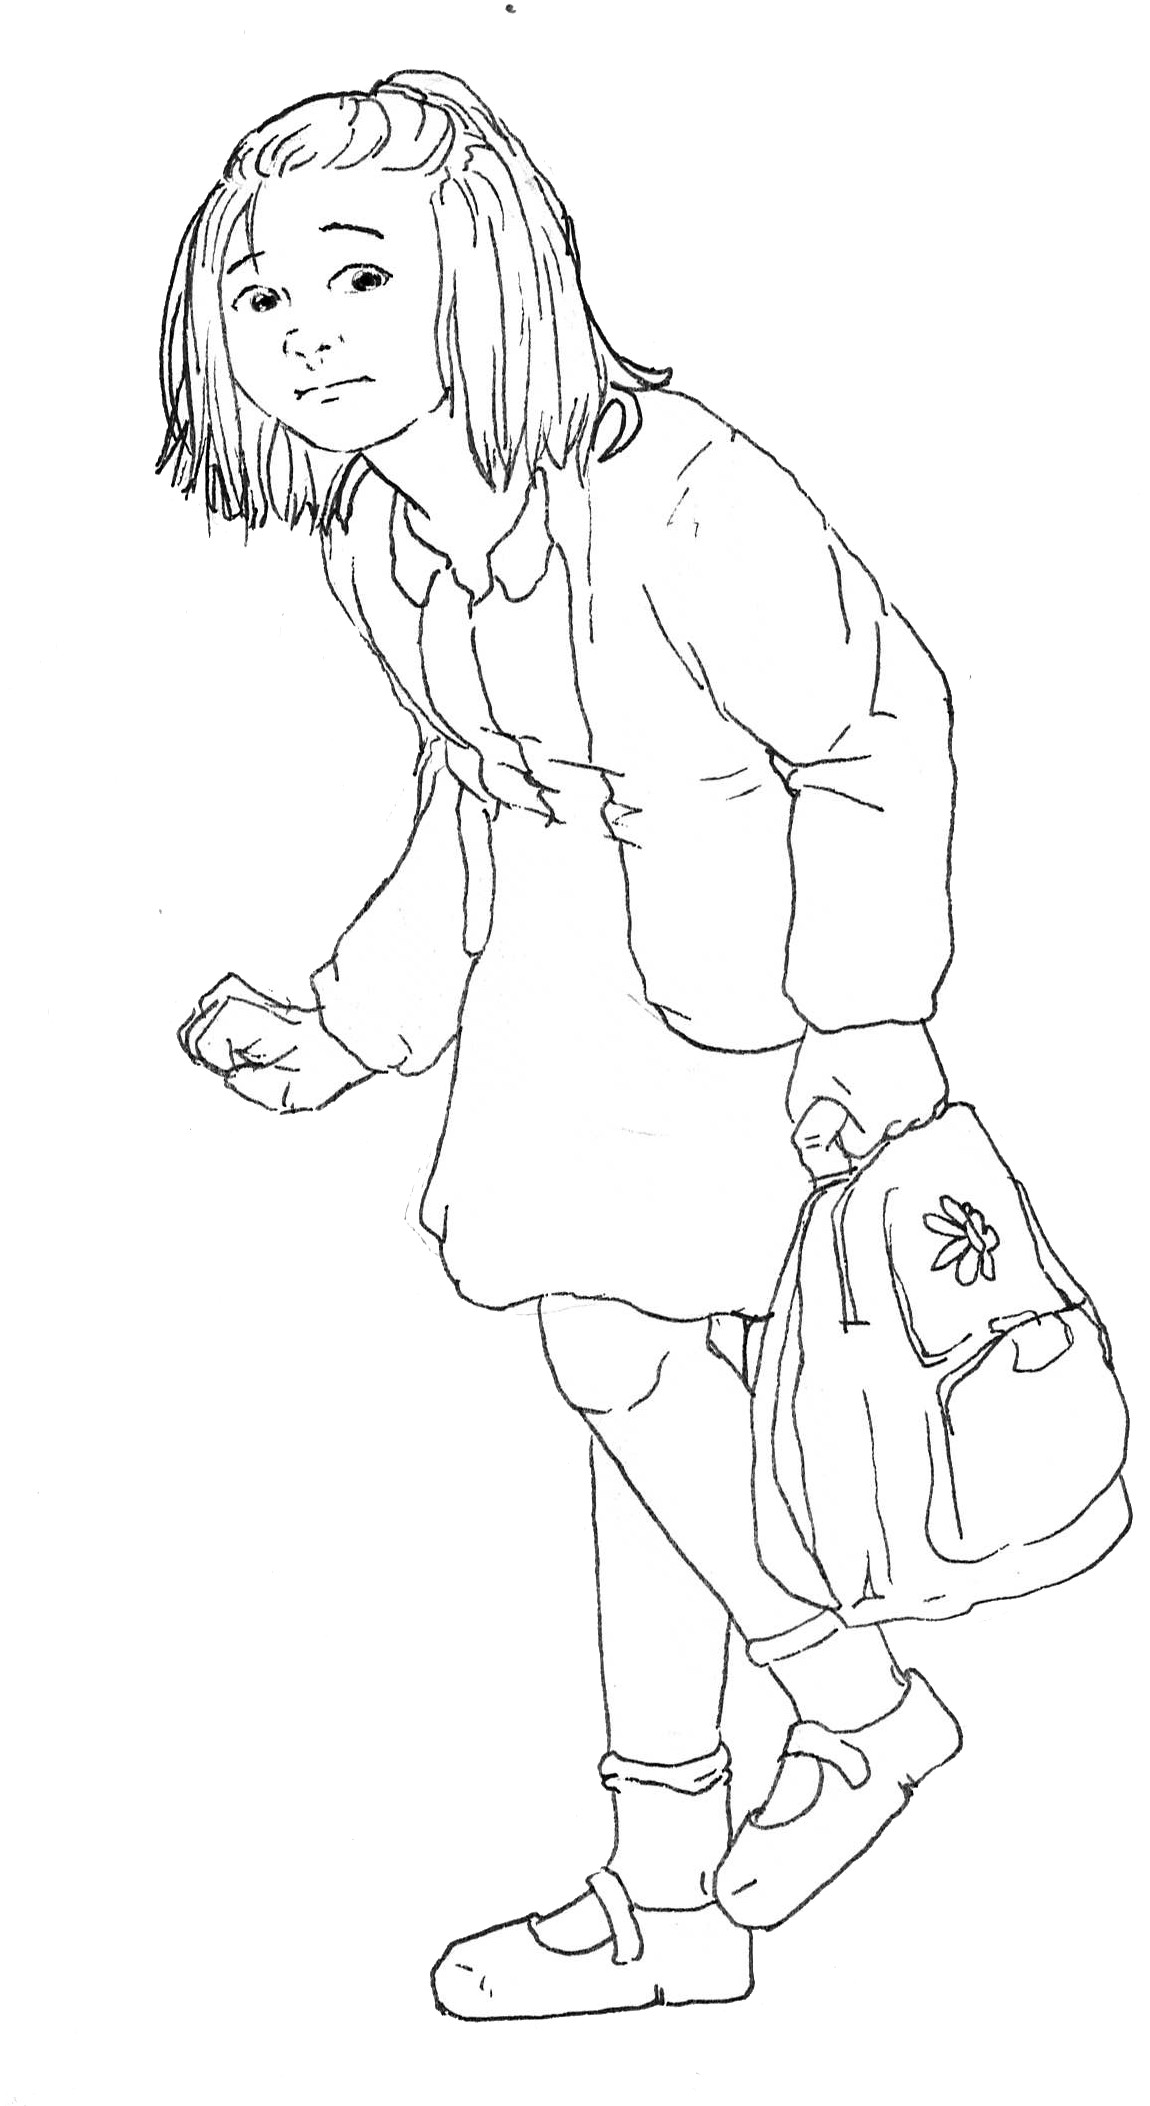 Elody in school uniform